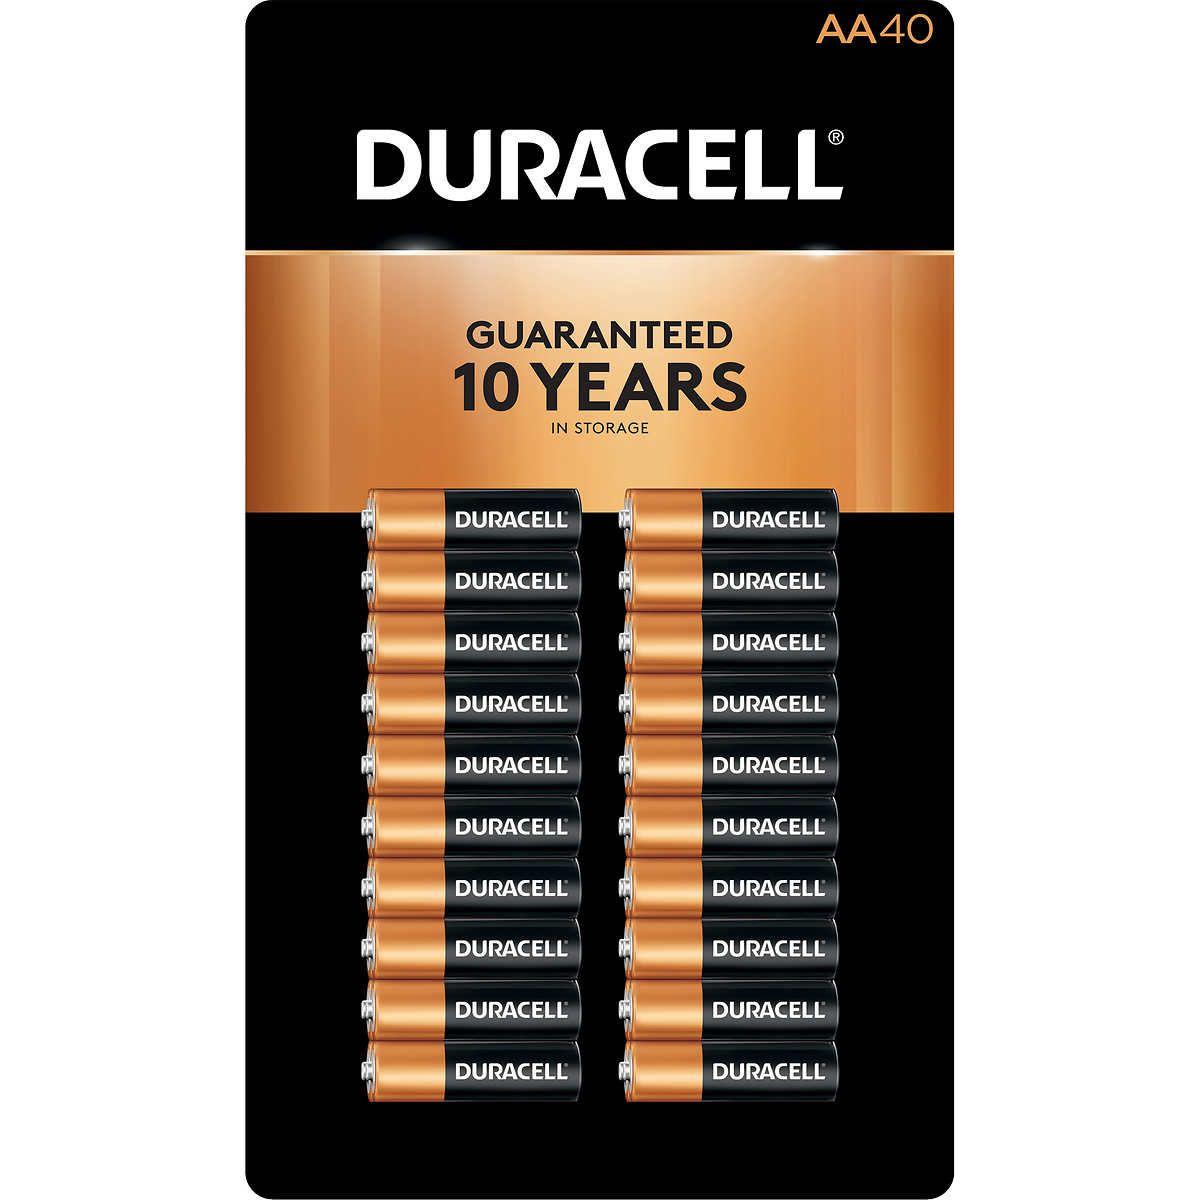 Duracell Coppertop Aa Alkaline Batteries 40 Count In 2020 Garage Storage Racks Overhead Garage Storage Duracell